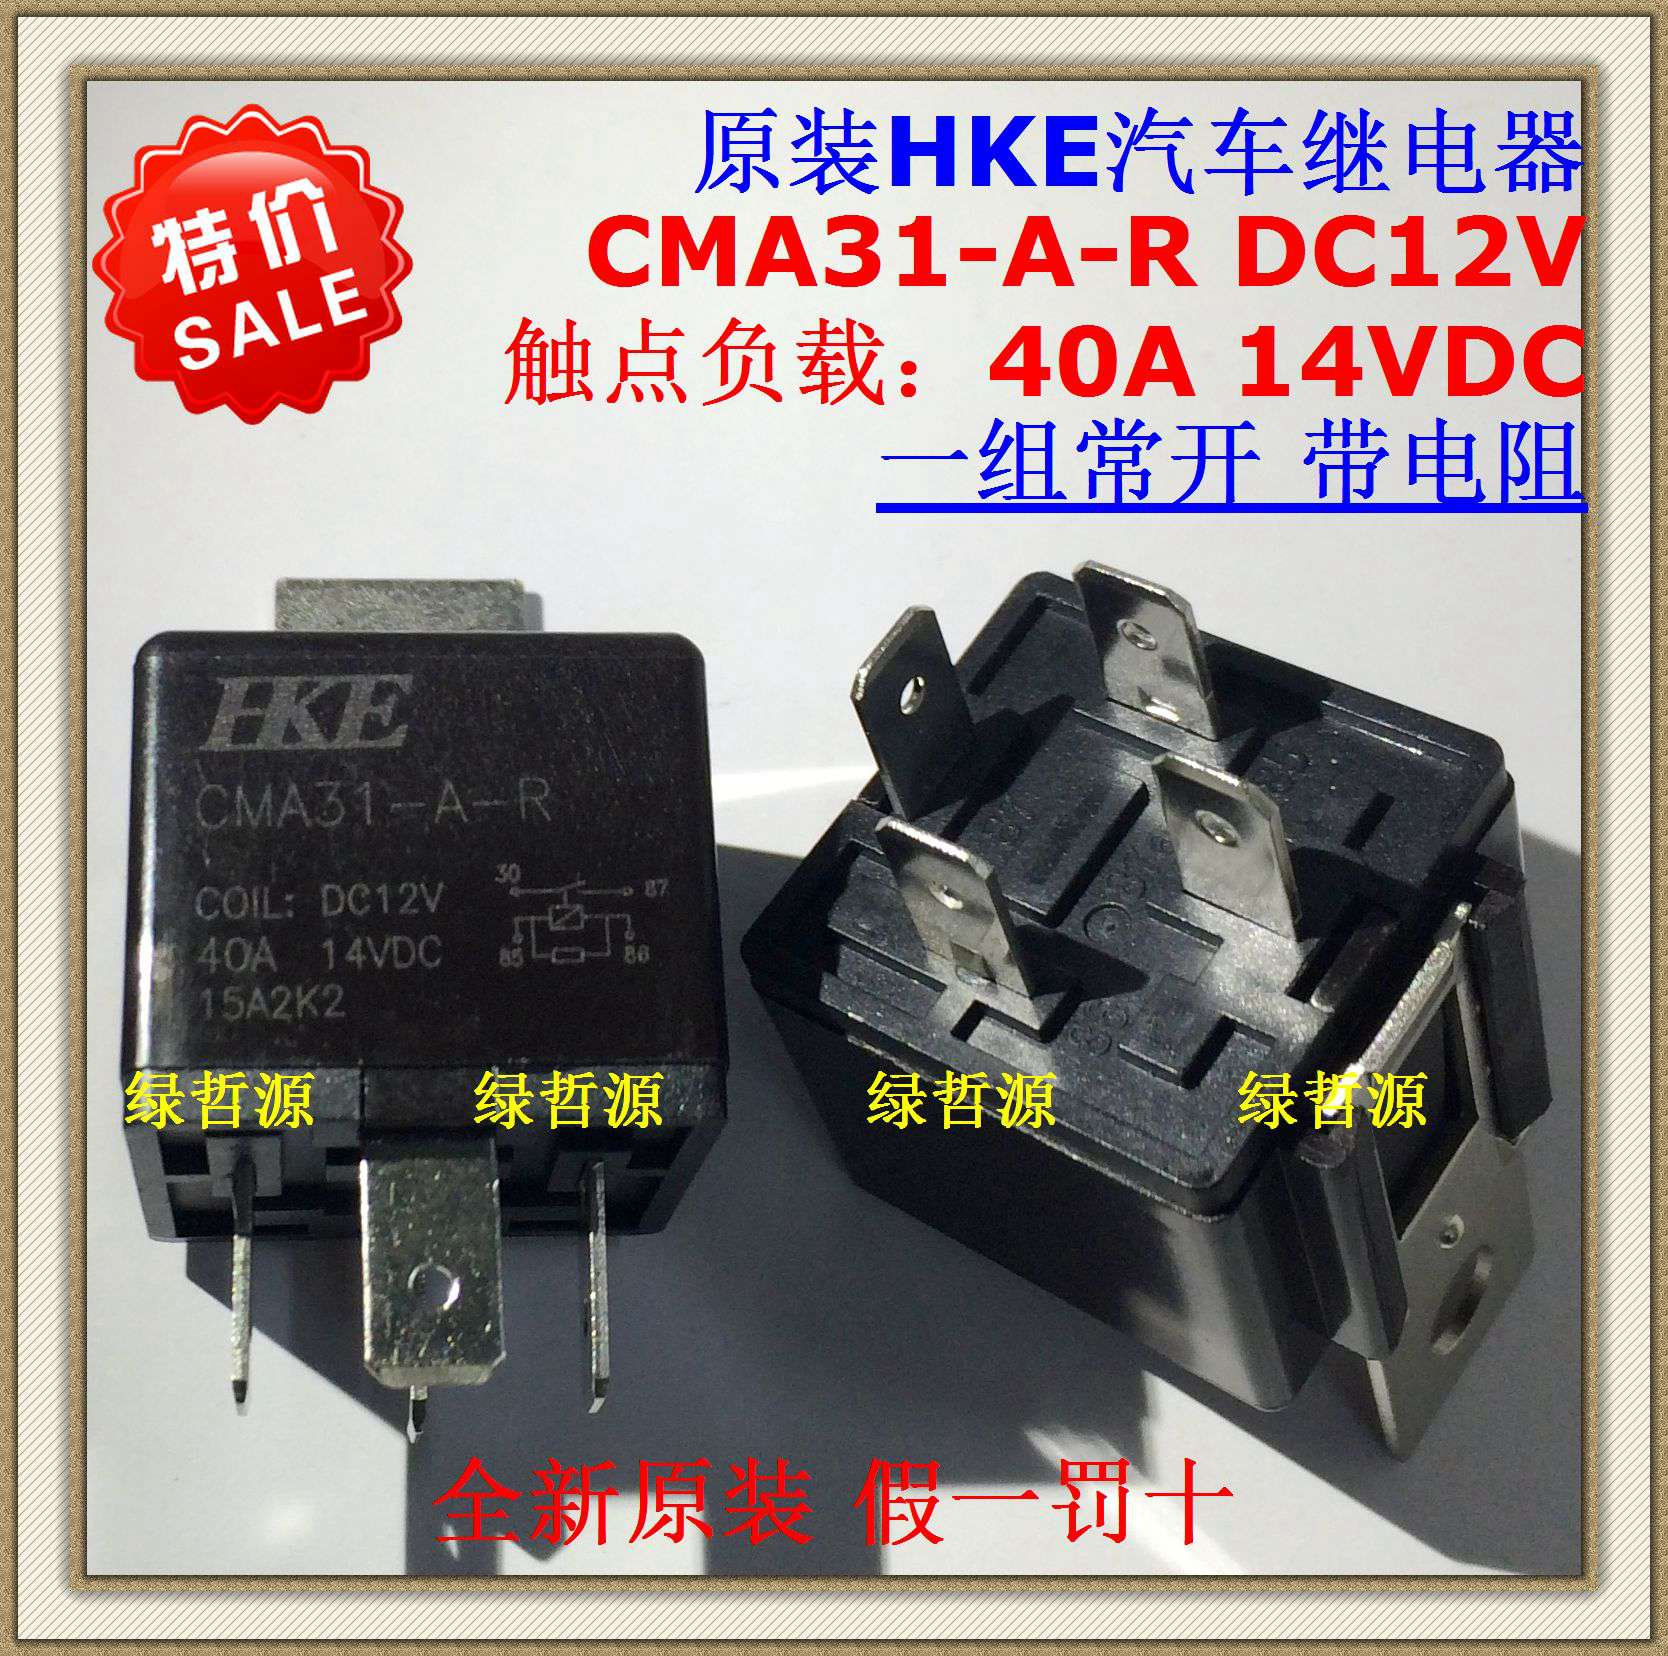 USD 605 HKE Sinks Harbor Automotive Relay CMA31AR DC12V 40A - Automotive Relay Normally Open